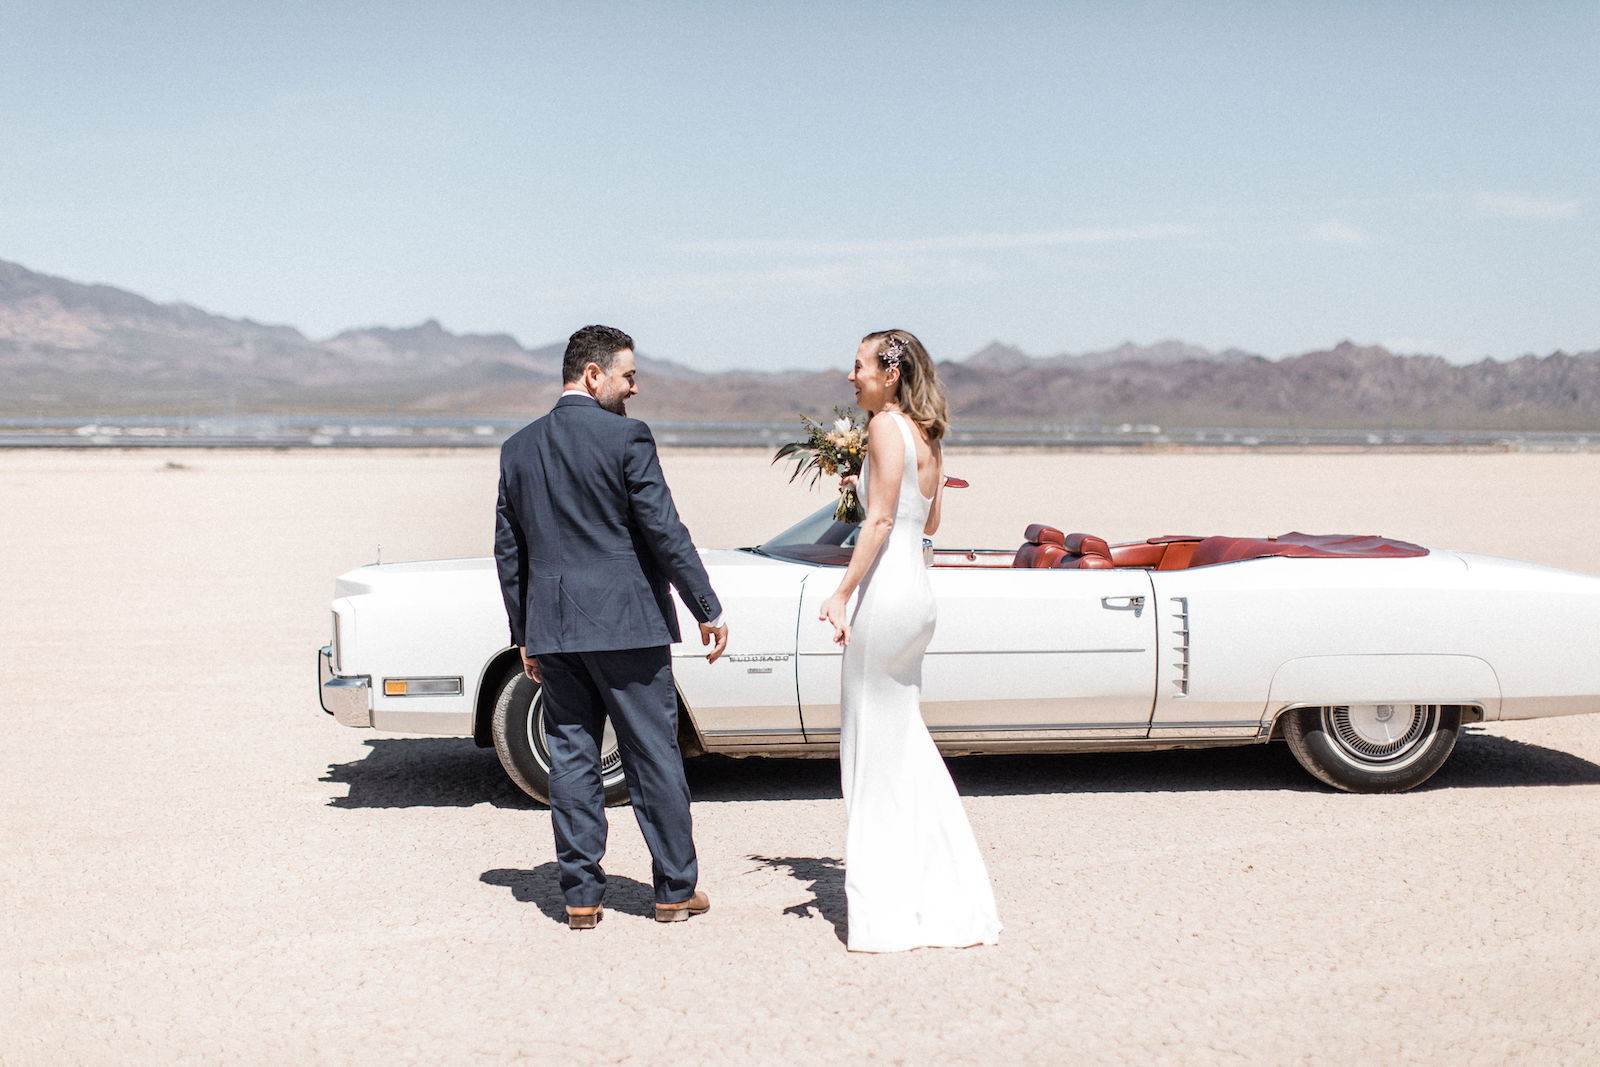 cadillac convertible dry lake bed elopement 00003.jpg